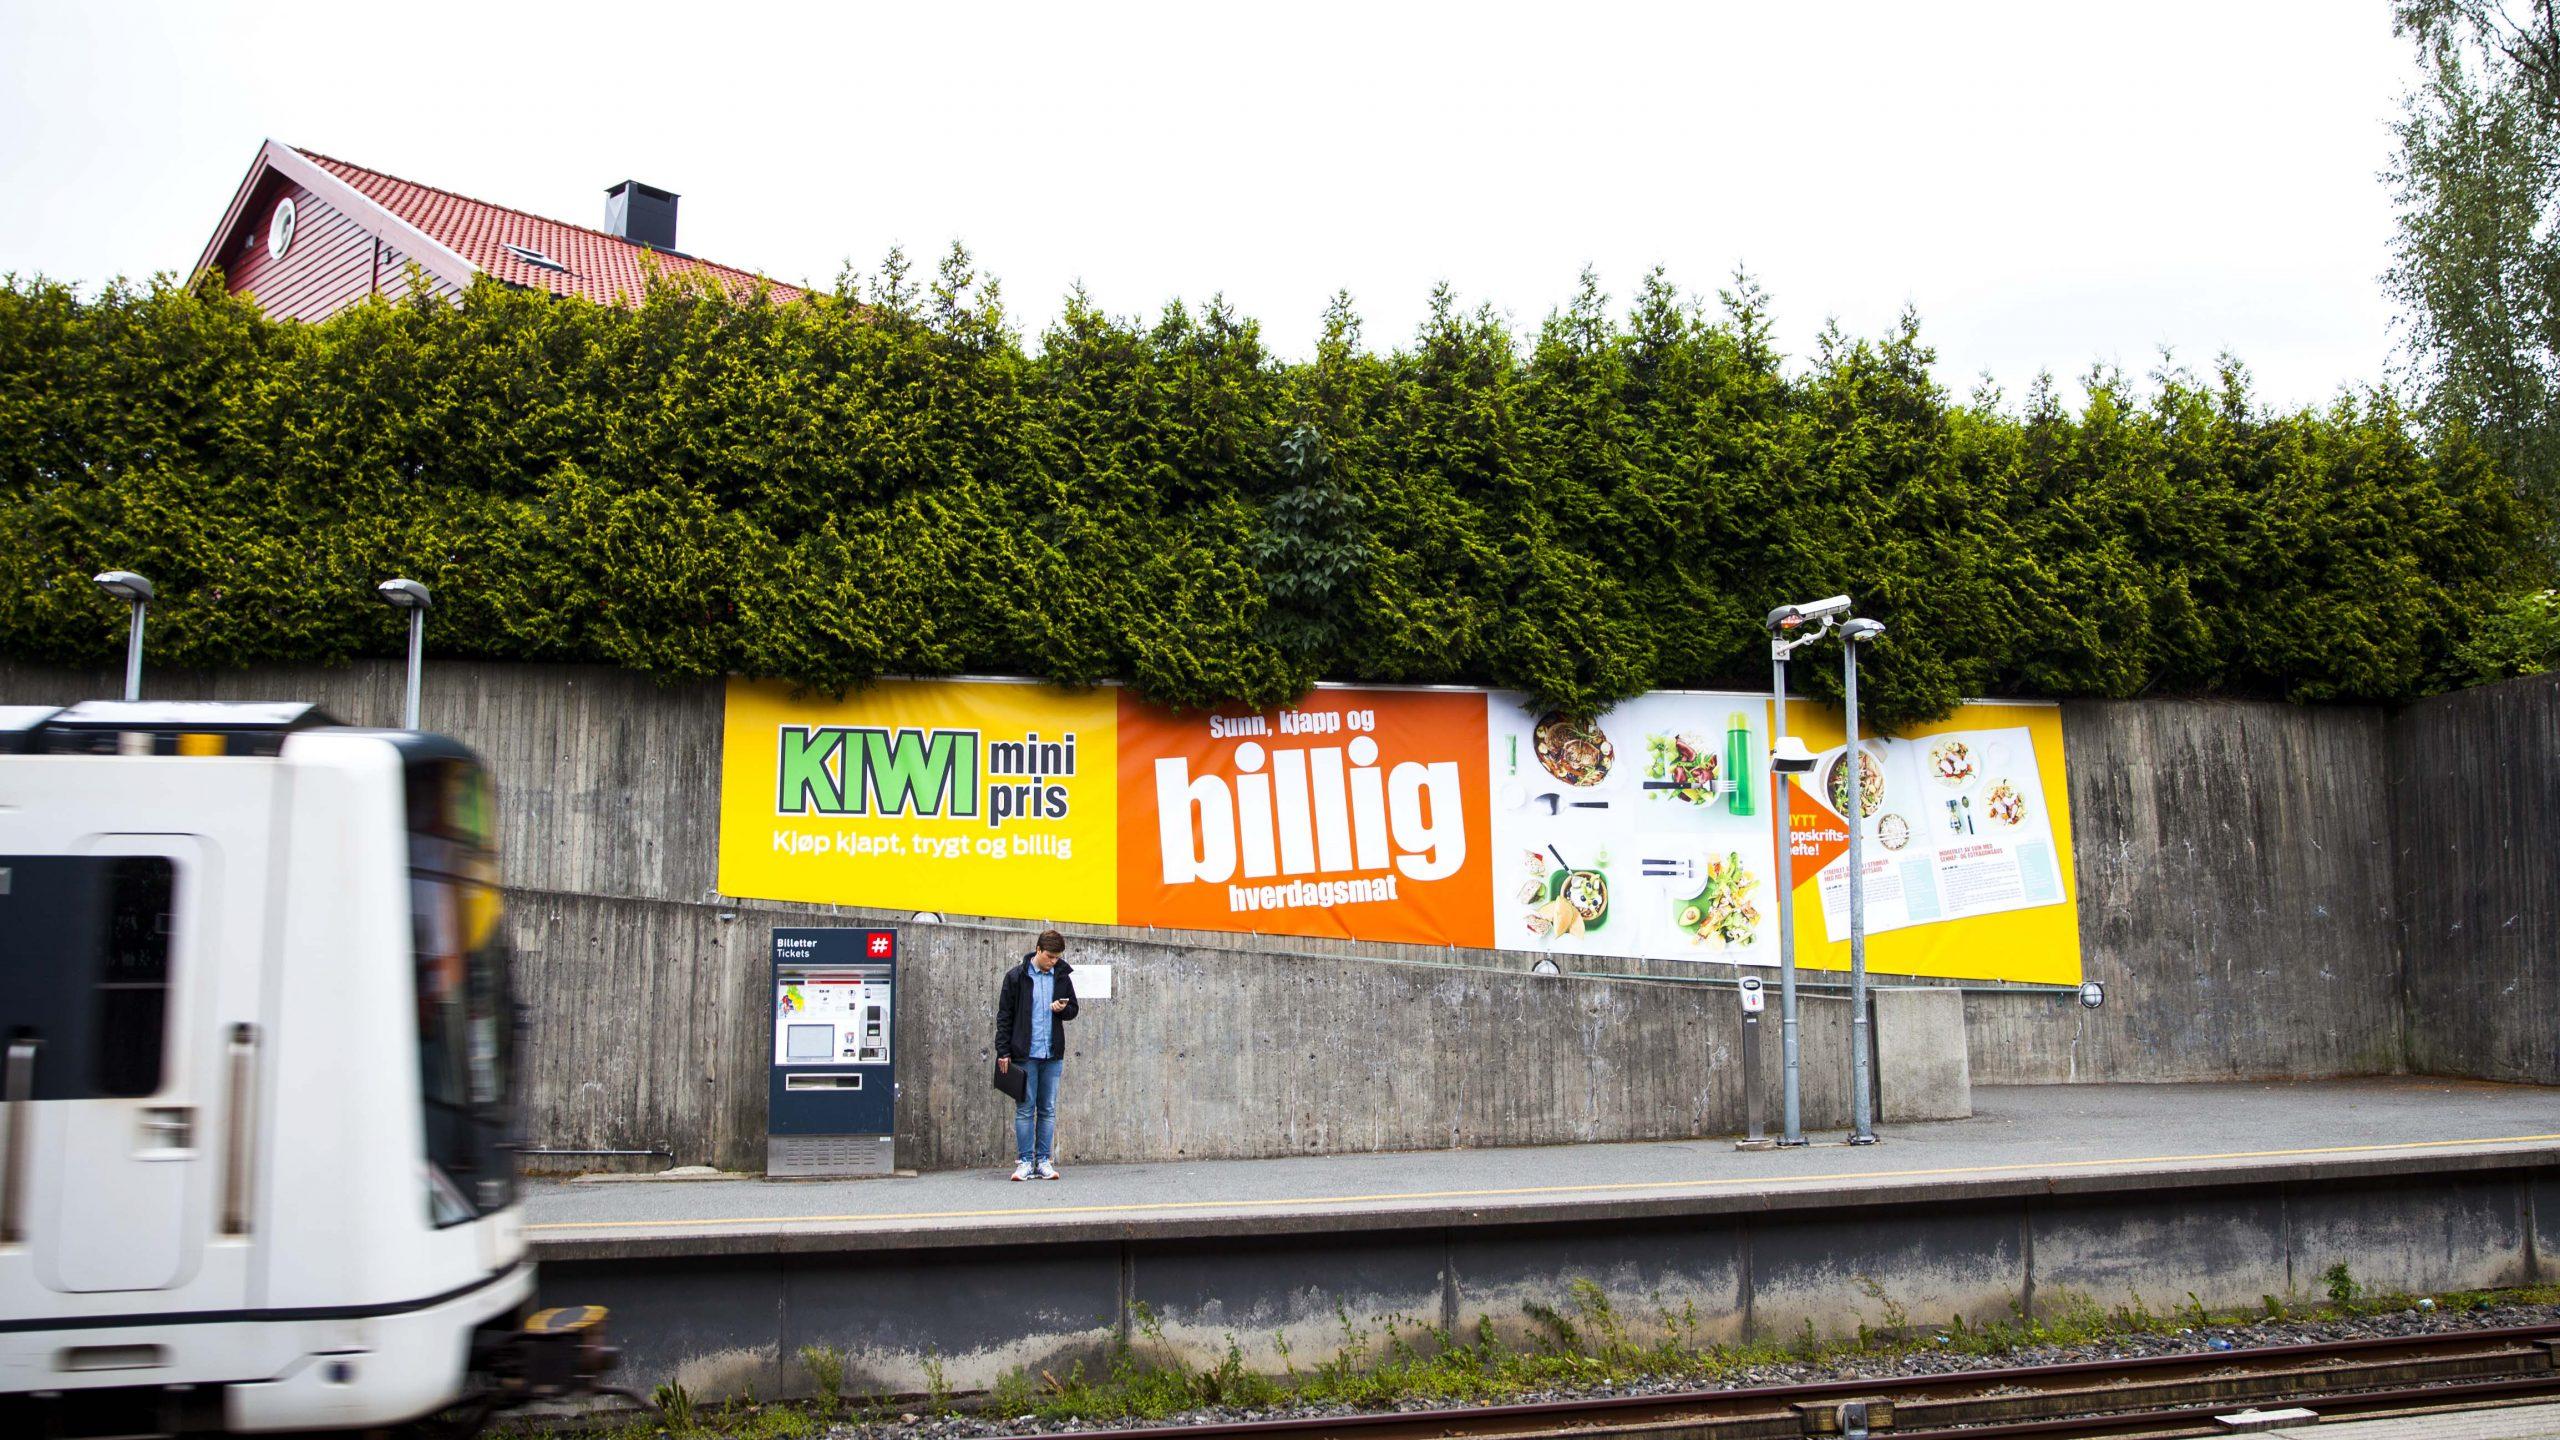 kiwi-ulleval-metrobanner.jpg